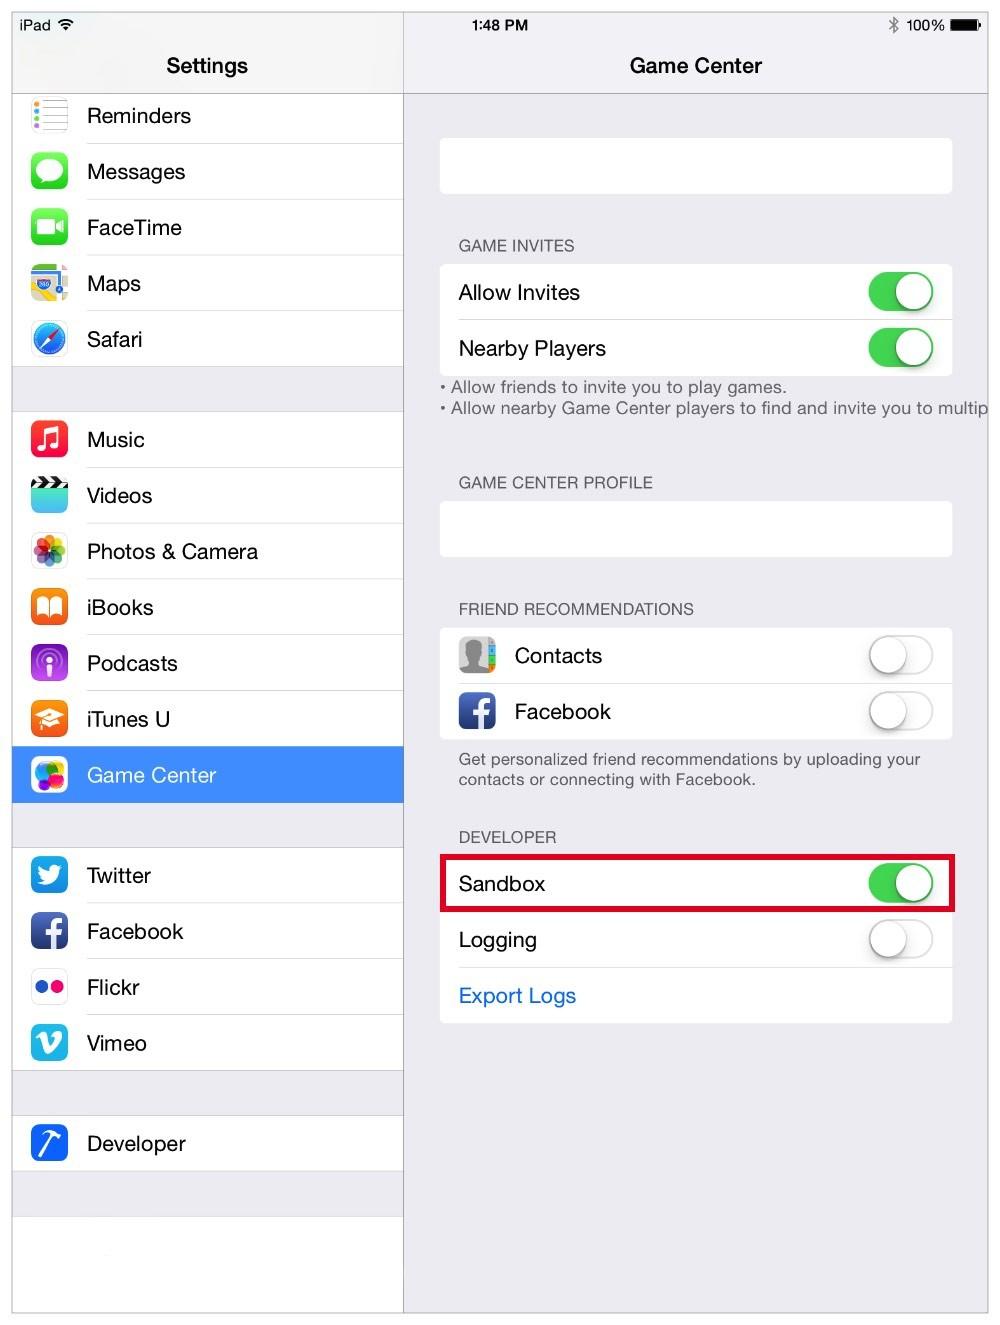 Apple Removes Game Center Sandbox, Migrates Test Servers to